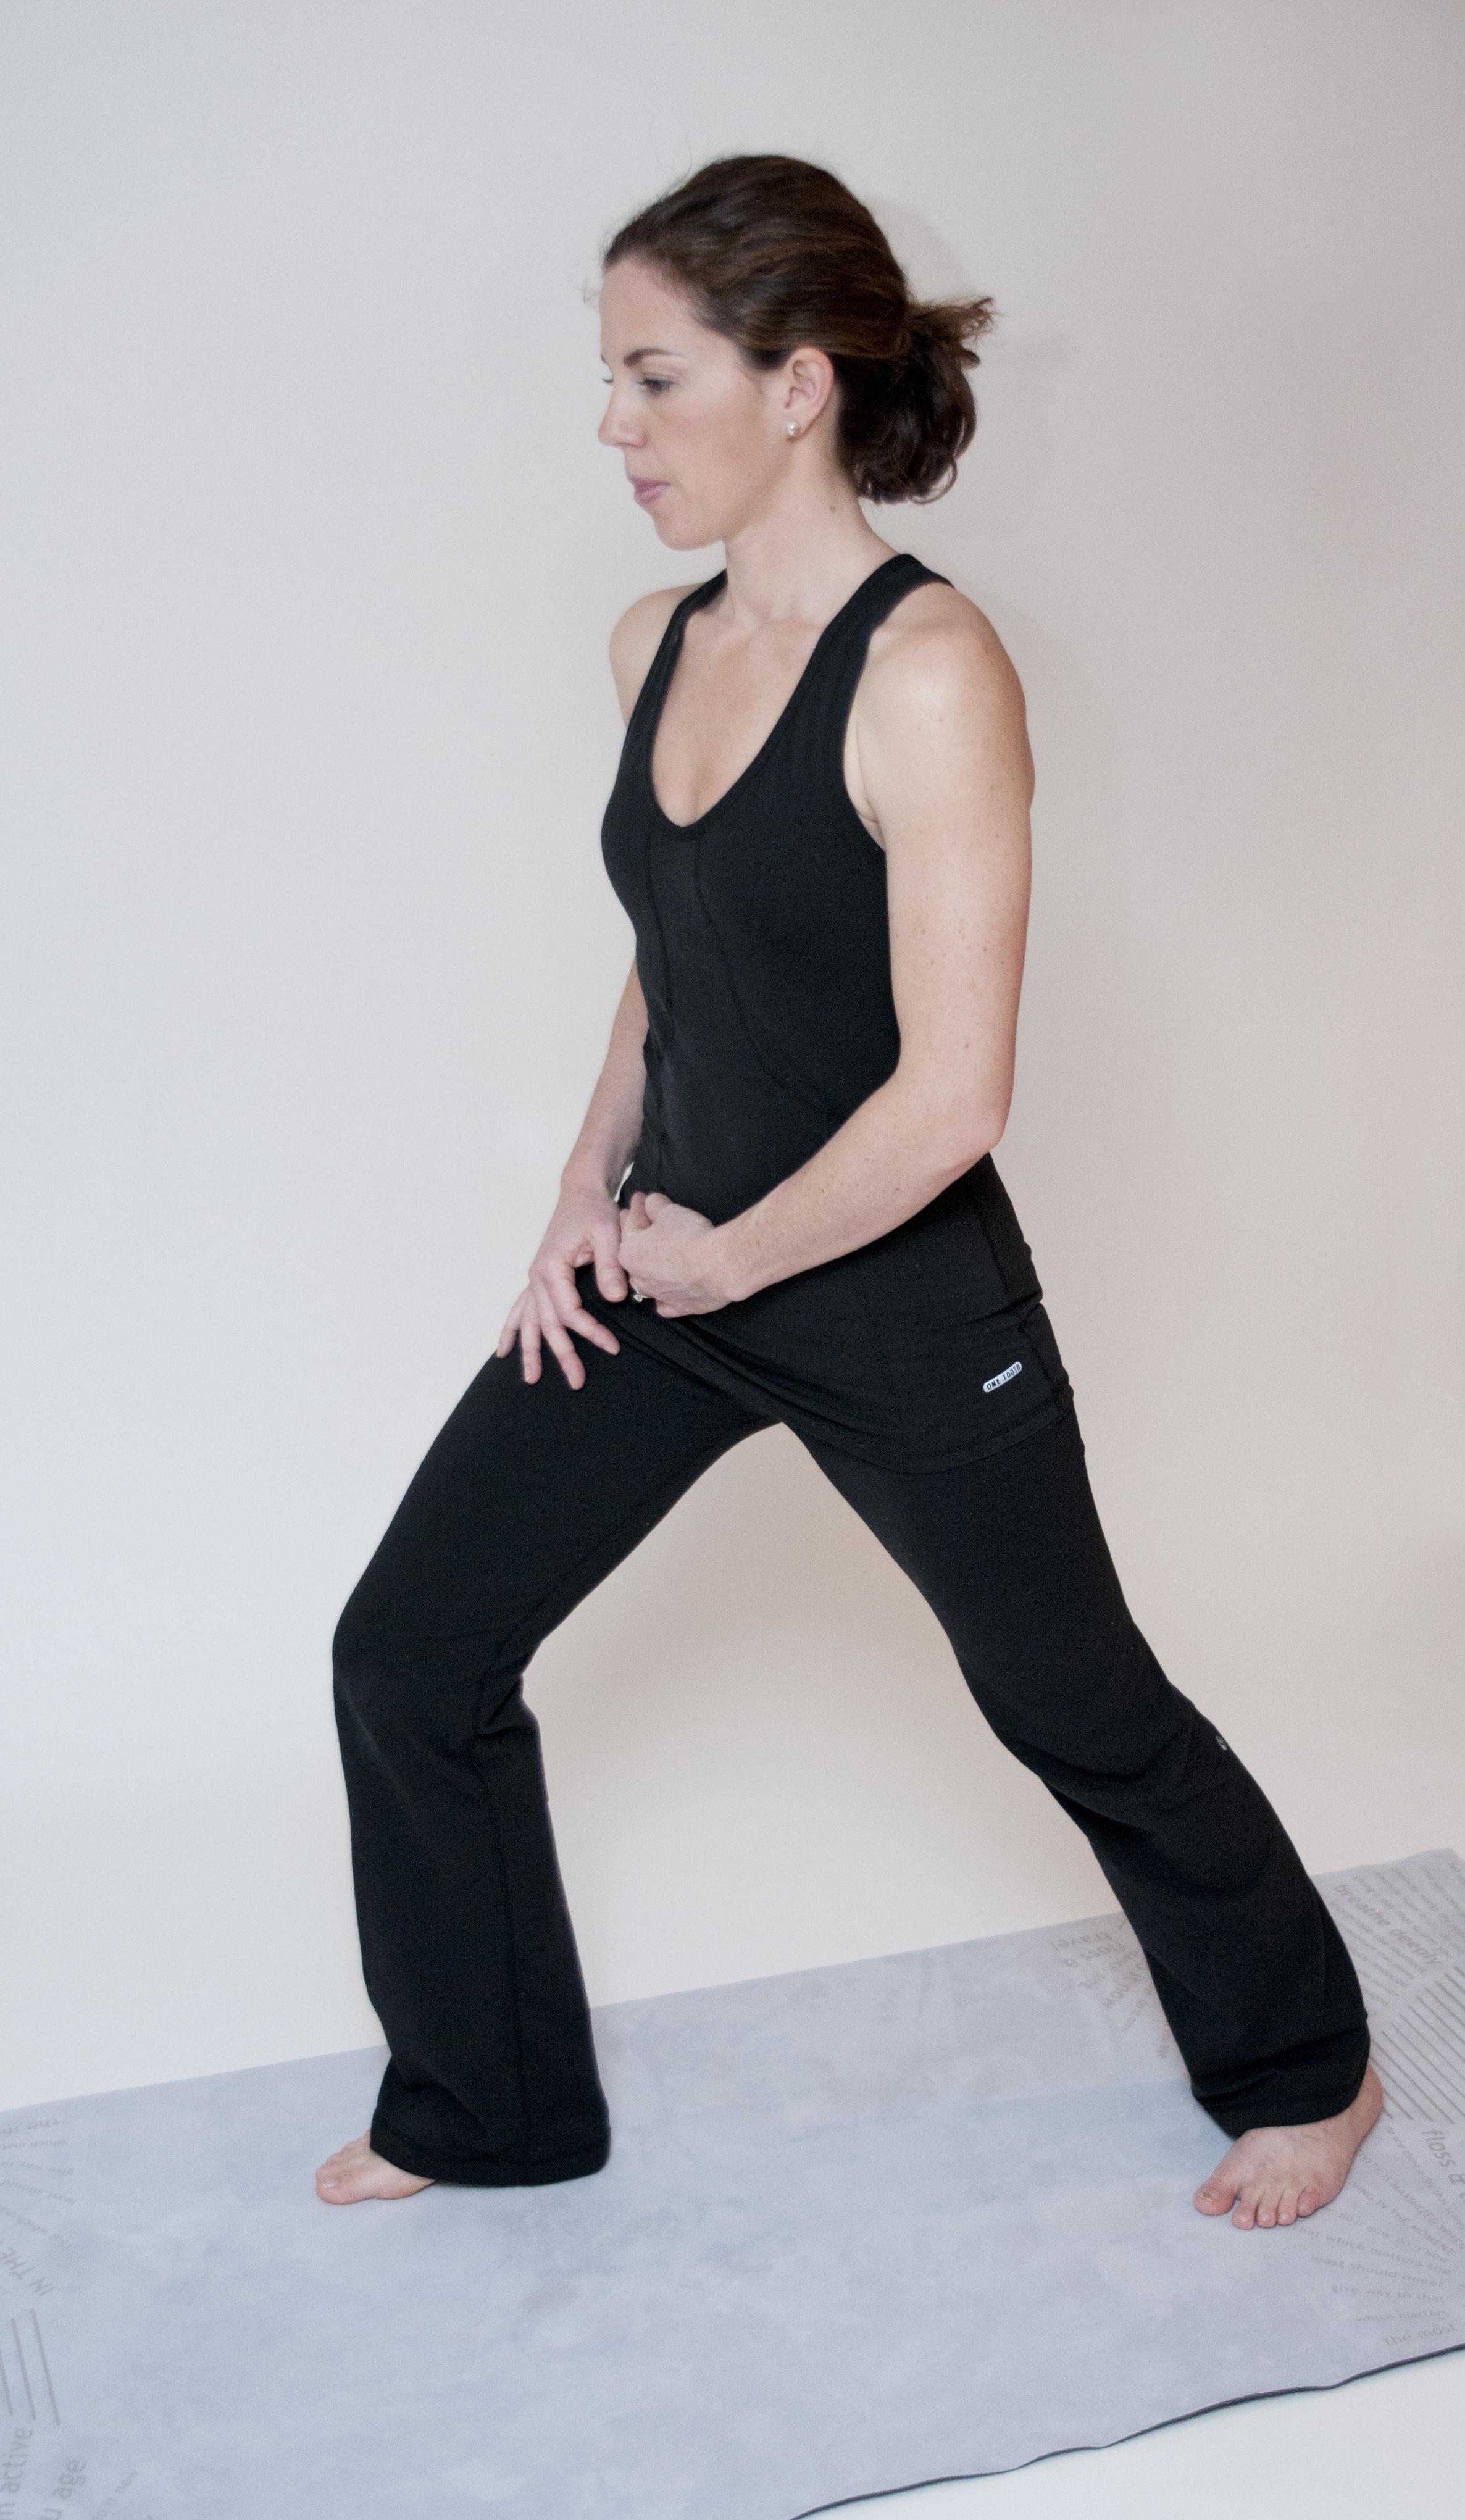 Standing(bent knee) calf stretch